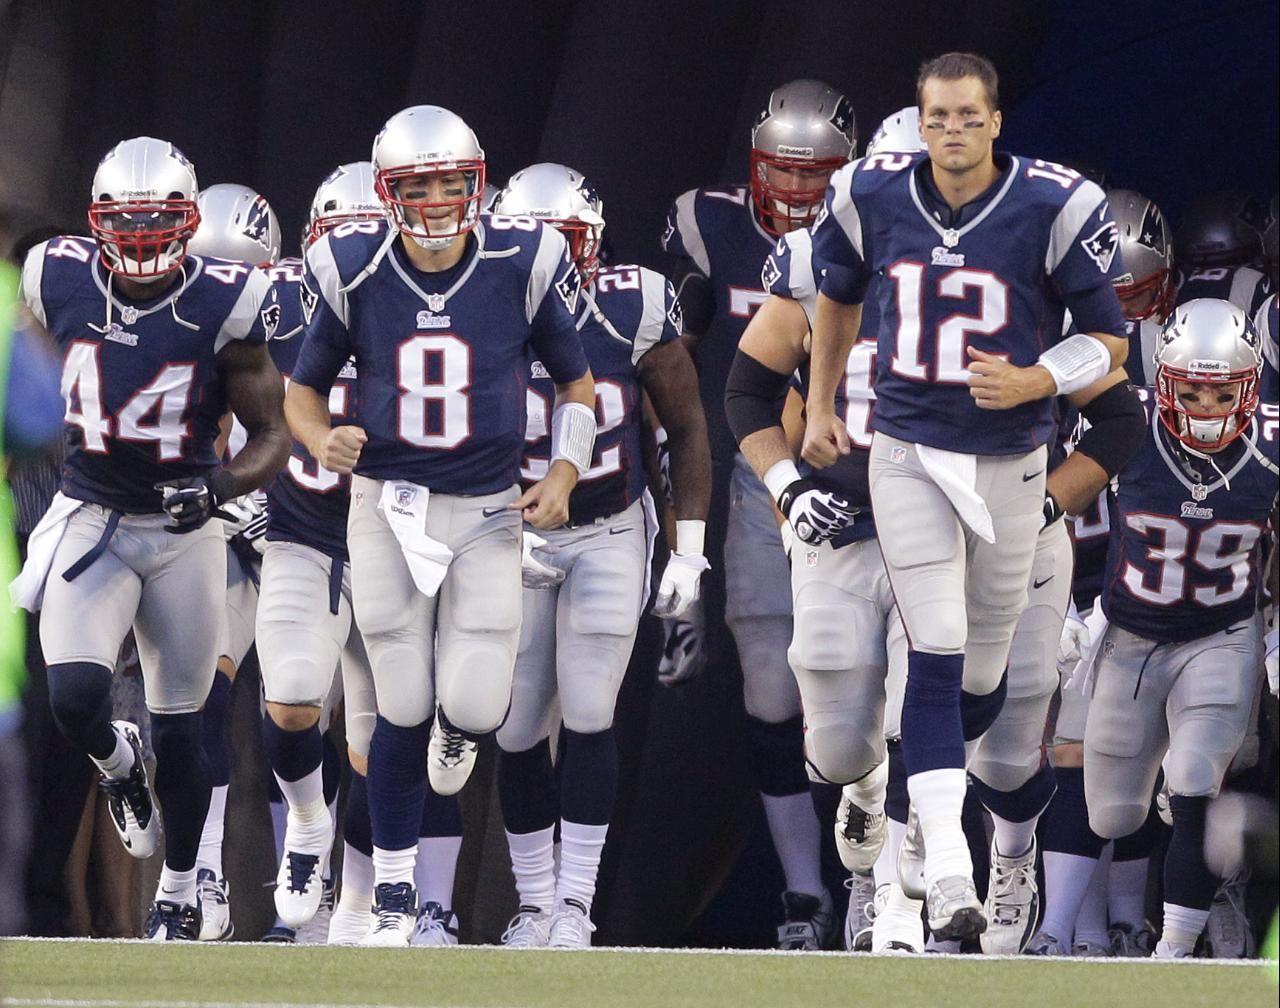 The Brady Bunch New England Patriots Patriots Team New England Patriots Merchandise